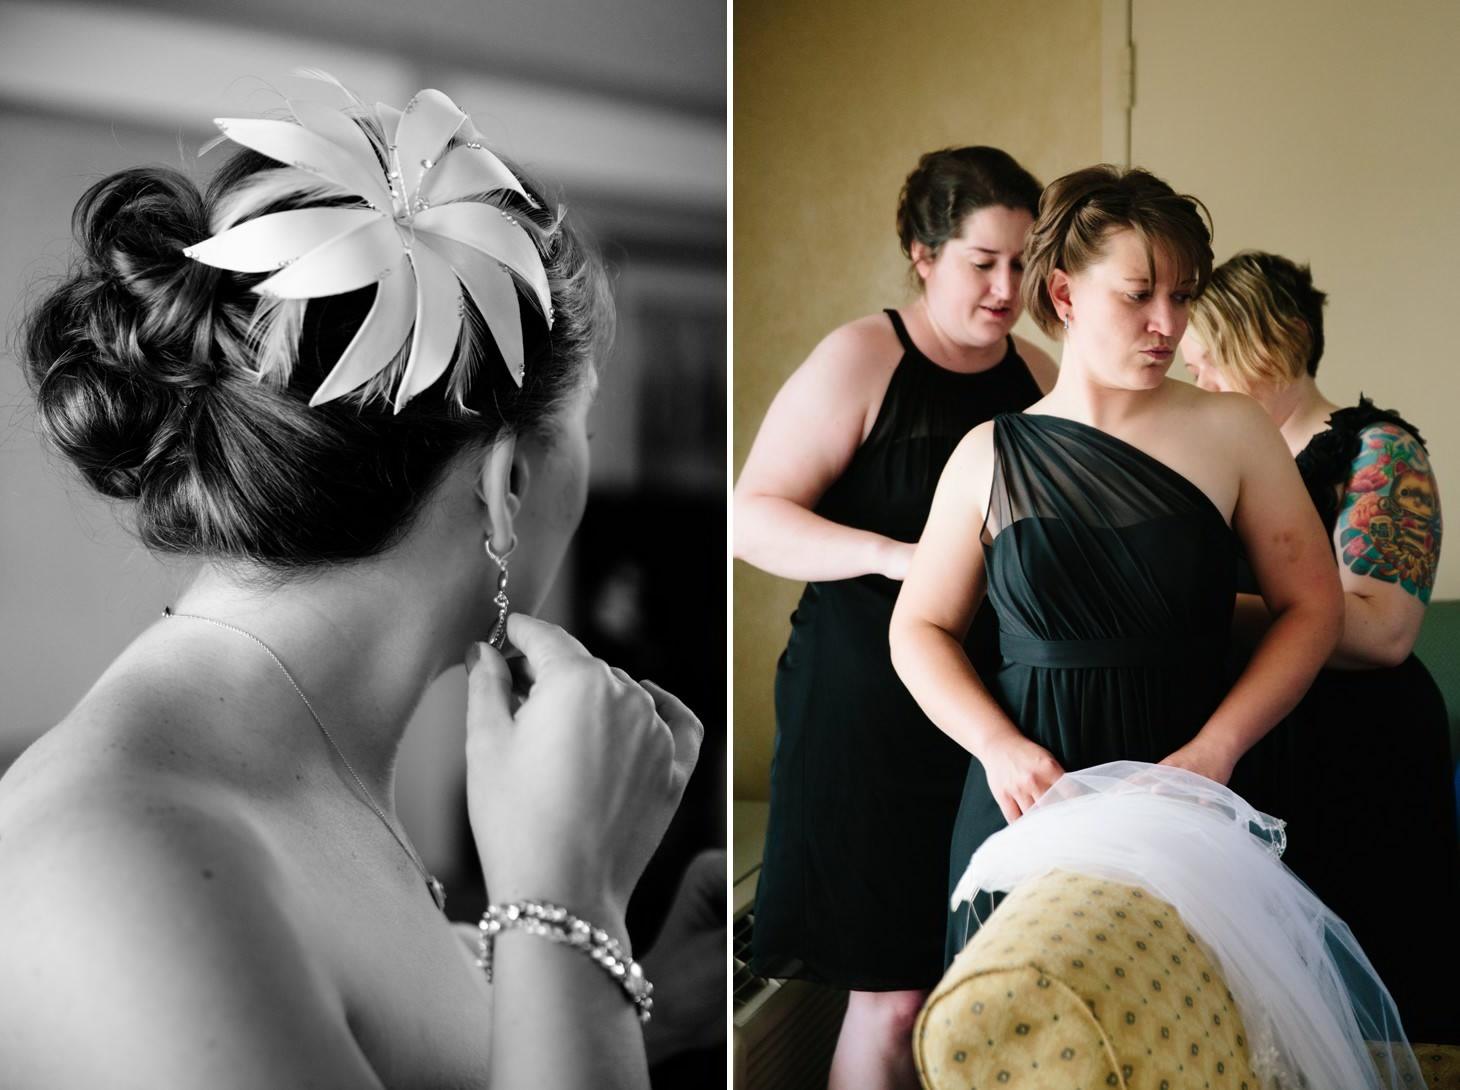 015-nyc-wedding-photographer-nj-nerdy-dr-who-firehouse-wedding-smitten-chickens.jpg